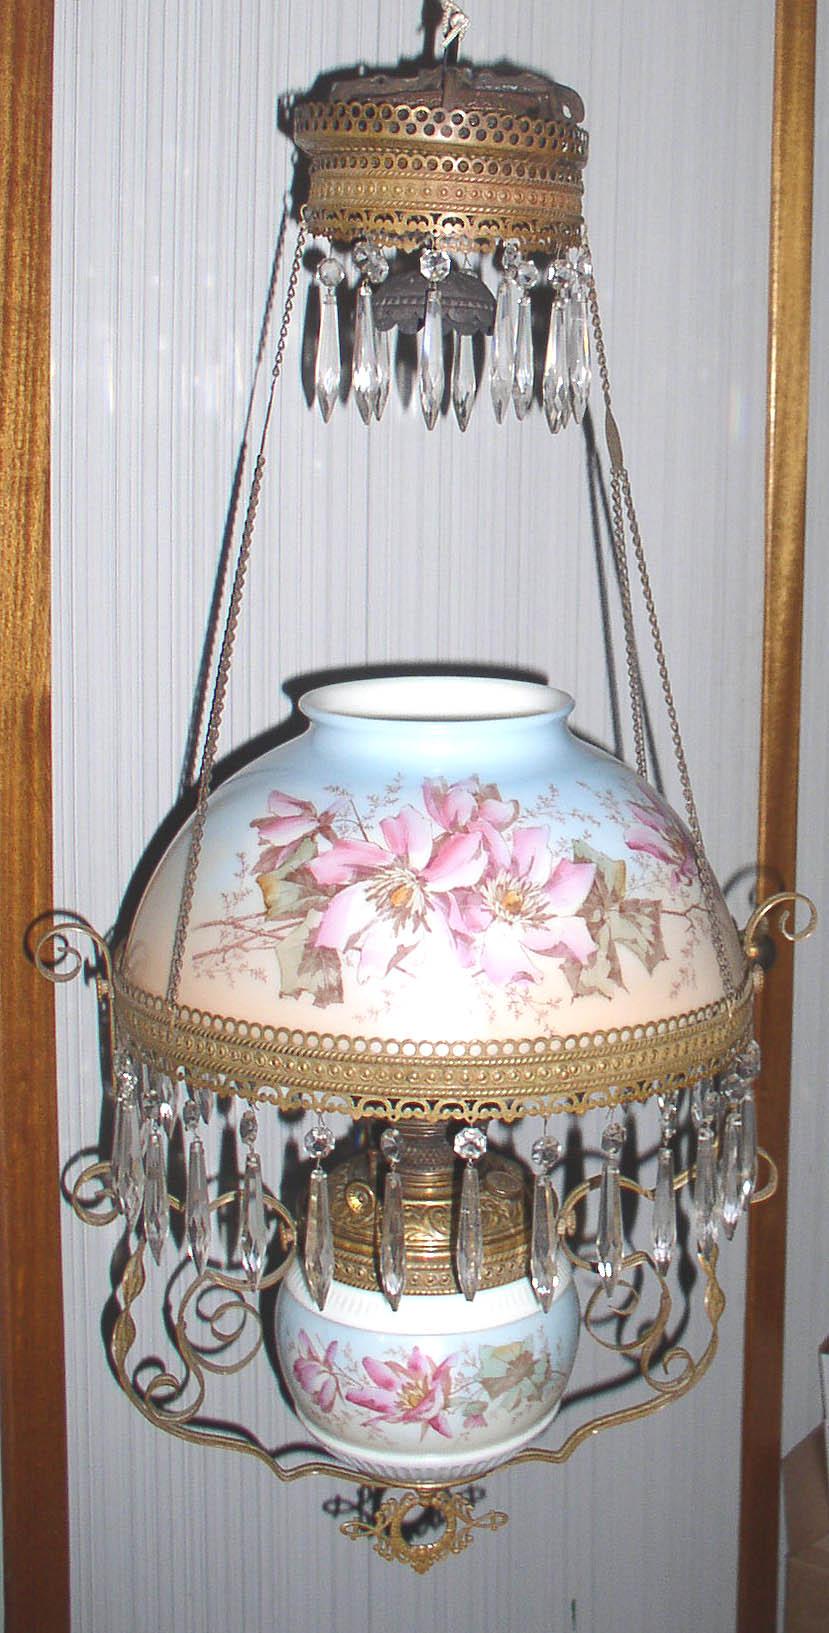 Bradley Hubbard B Amp H Hanging Library Parlor Oil Lamp